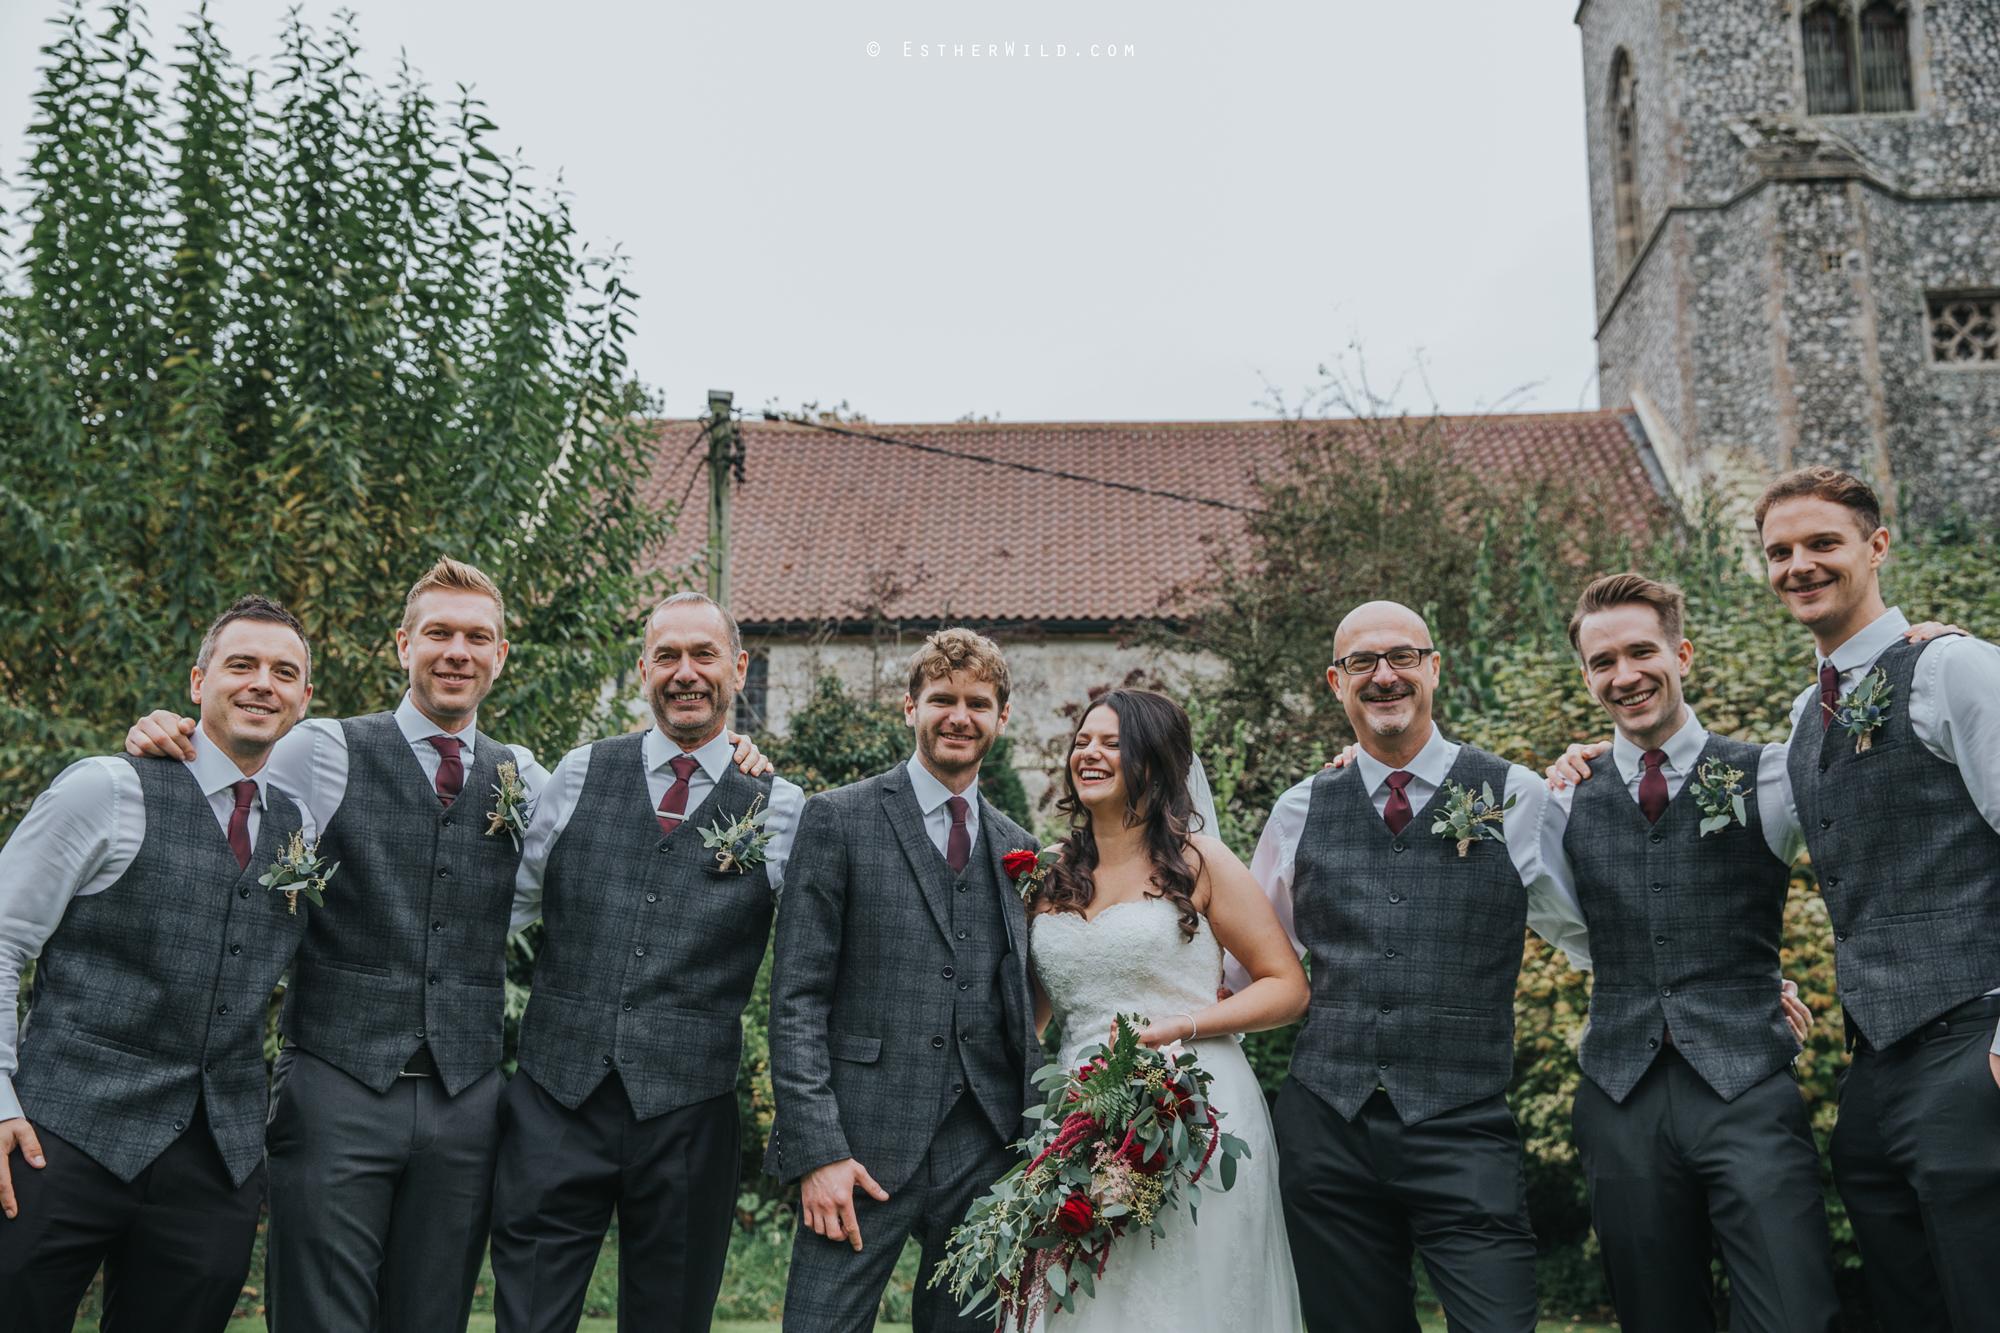 Reading_Room_Weddings_Alby_Norwich_Photographer_Esther_Wild_IMG_1416.jpg